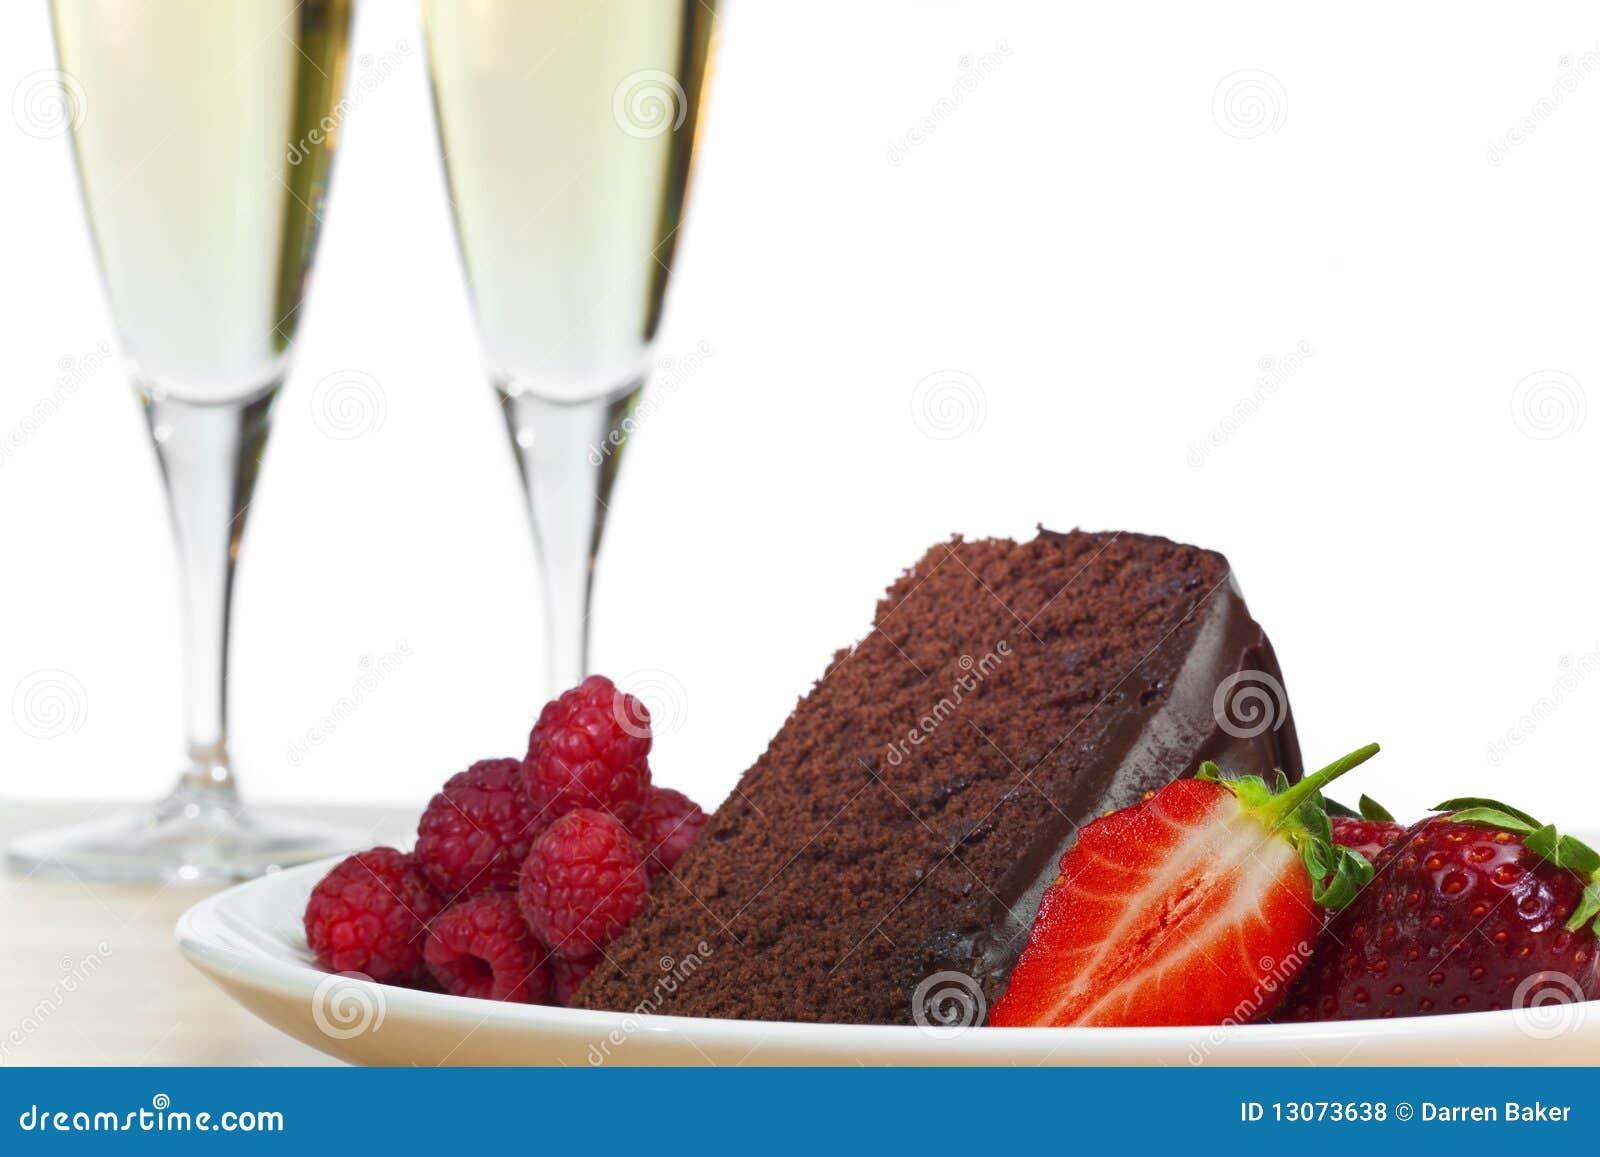 Champagne, Chocolate Cake Raspberries Strawberries